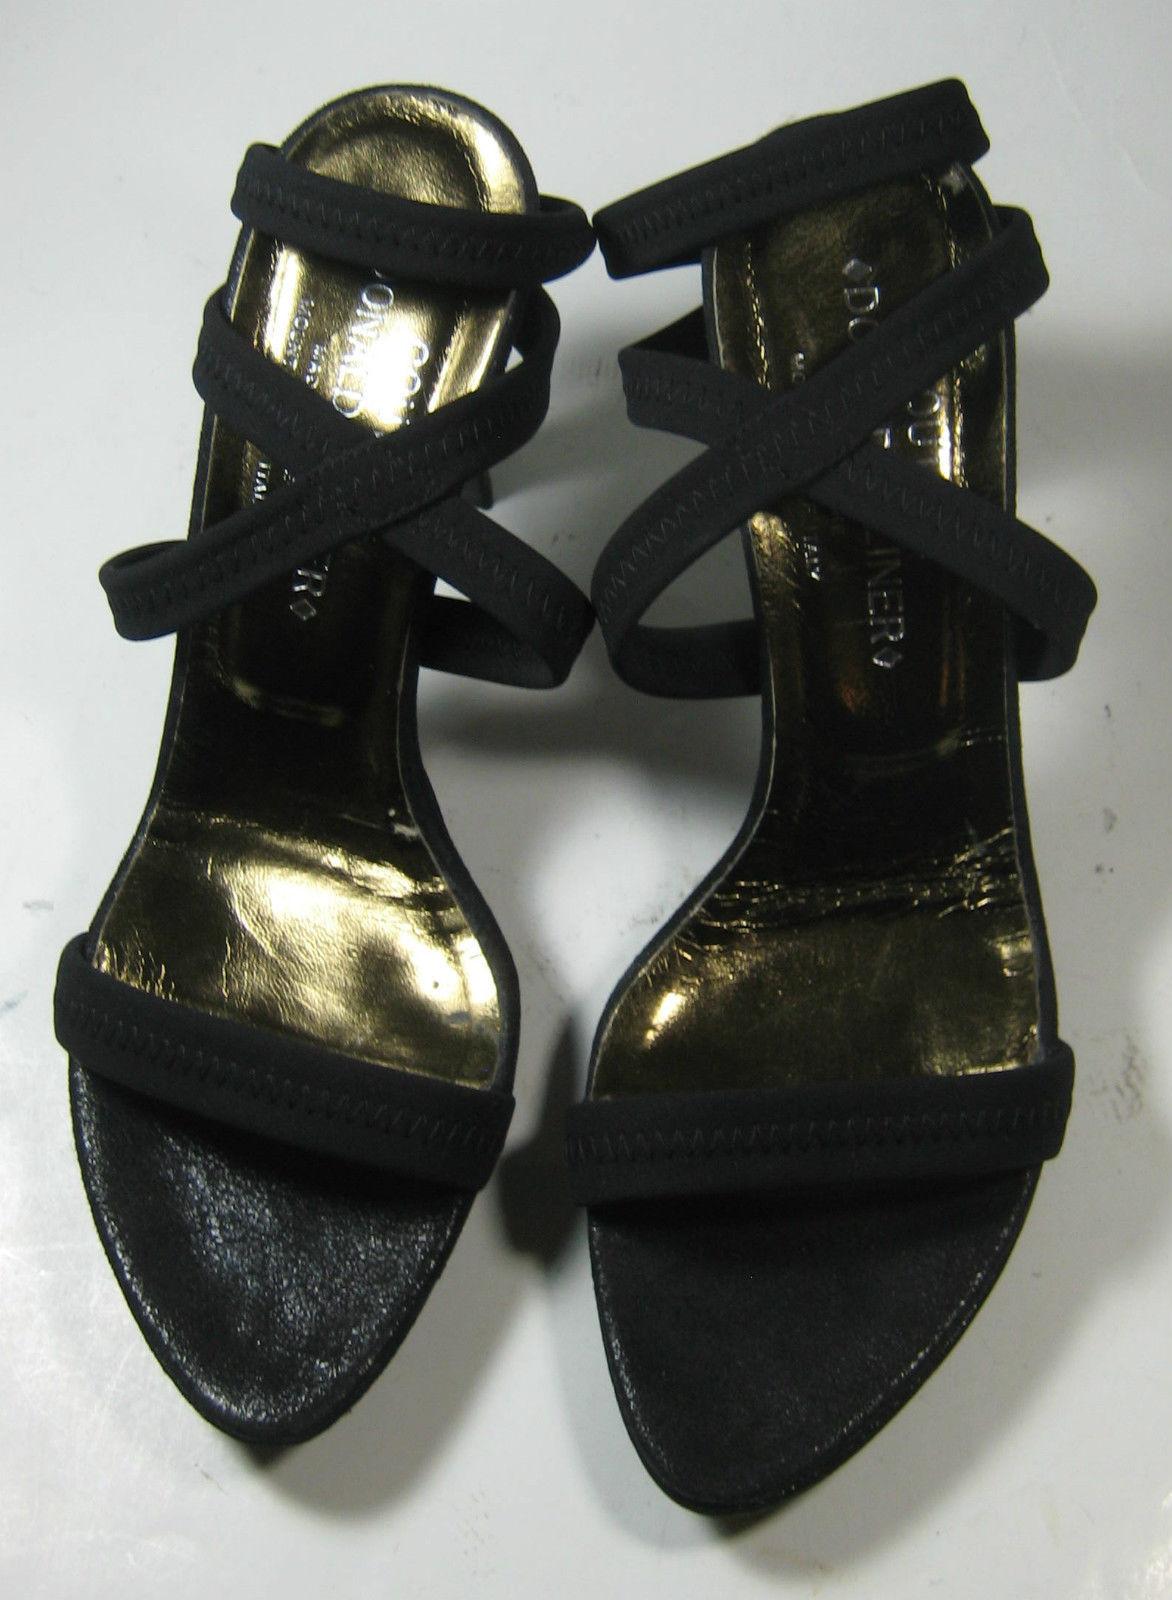 DONALD J. PLINER Couture 7.5M Exquisite Rich Strappy Heels Sandals Rare Exce